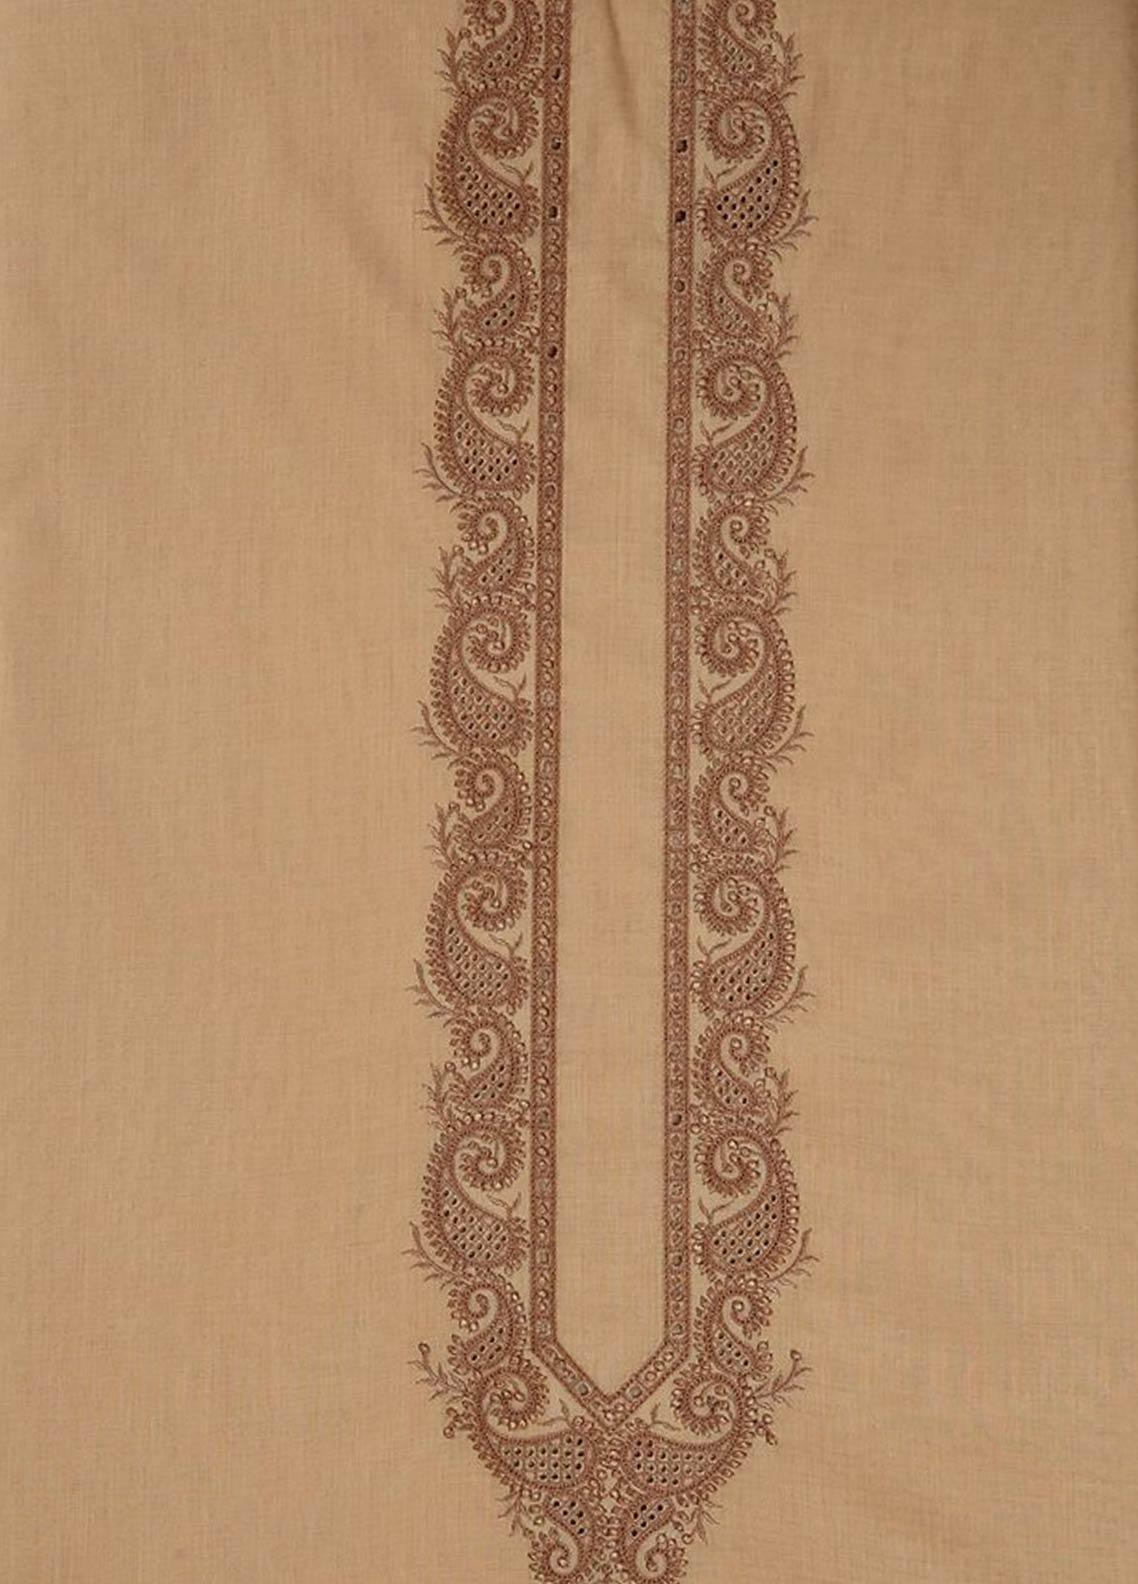 Dynasty Egyptian Delight 1904 Lawn Unstitched Men's Kameez Shalwar Fabric